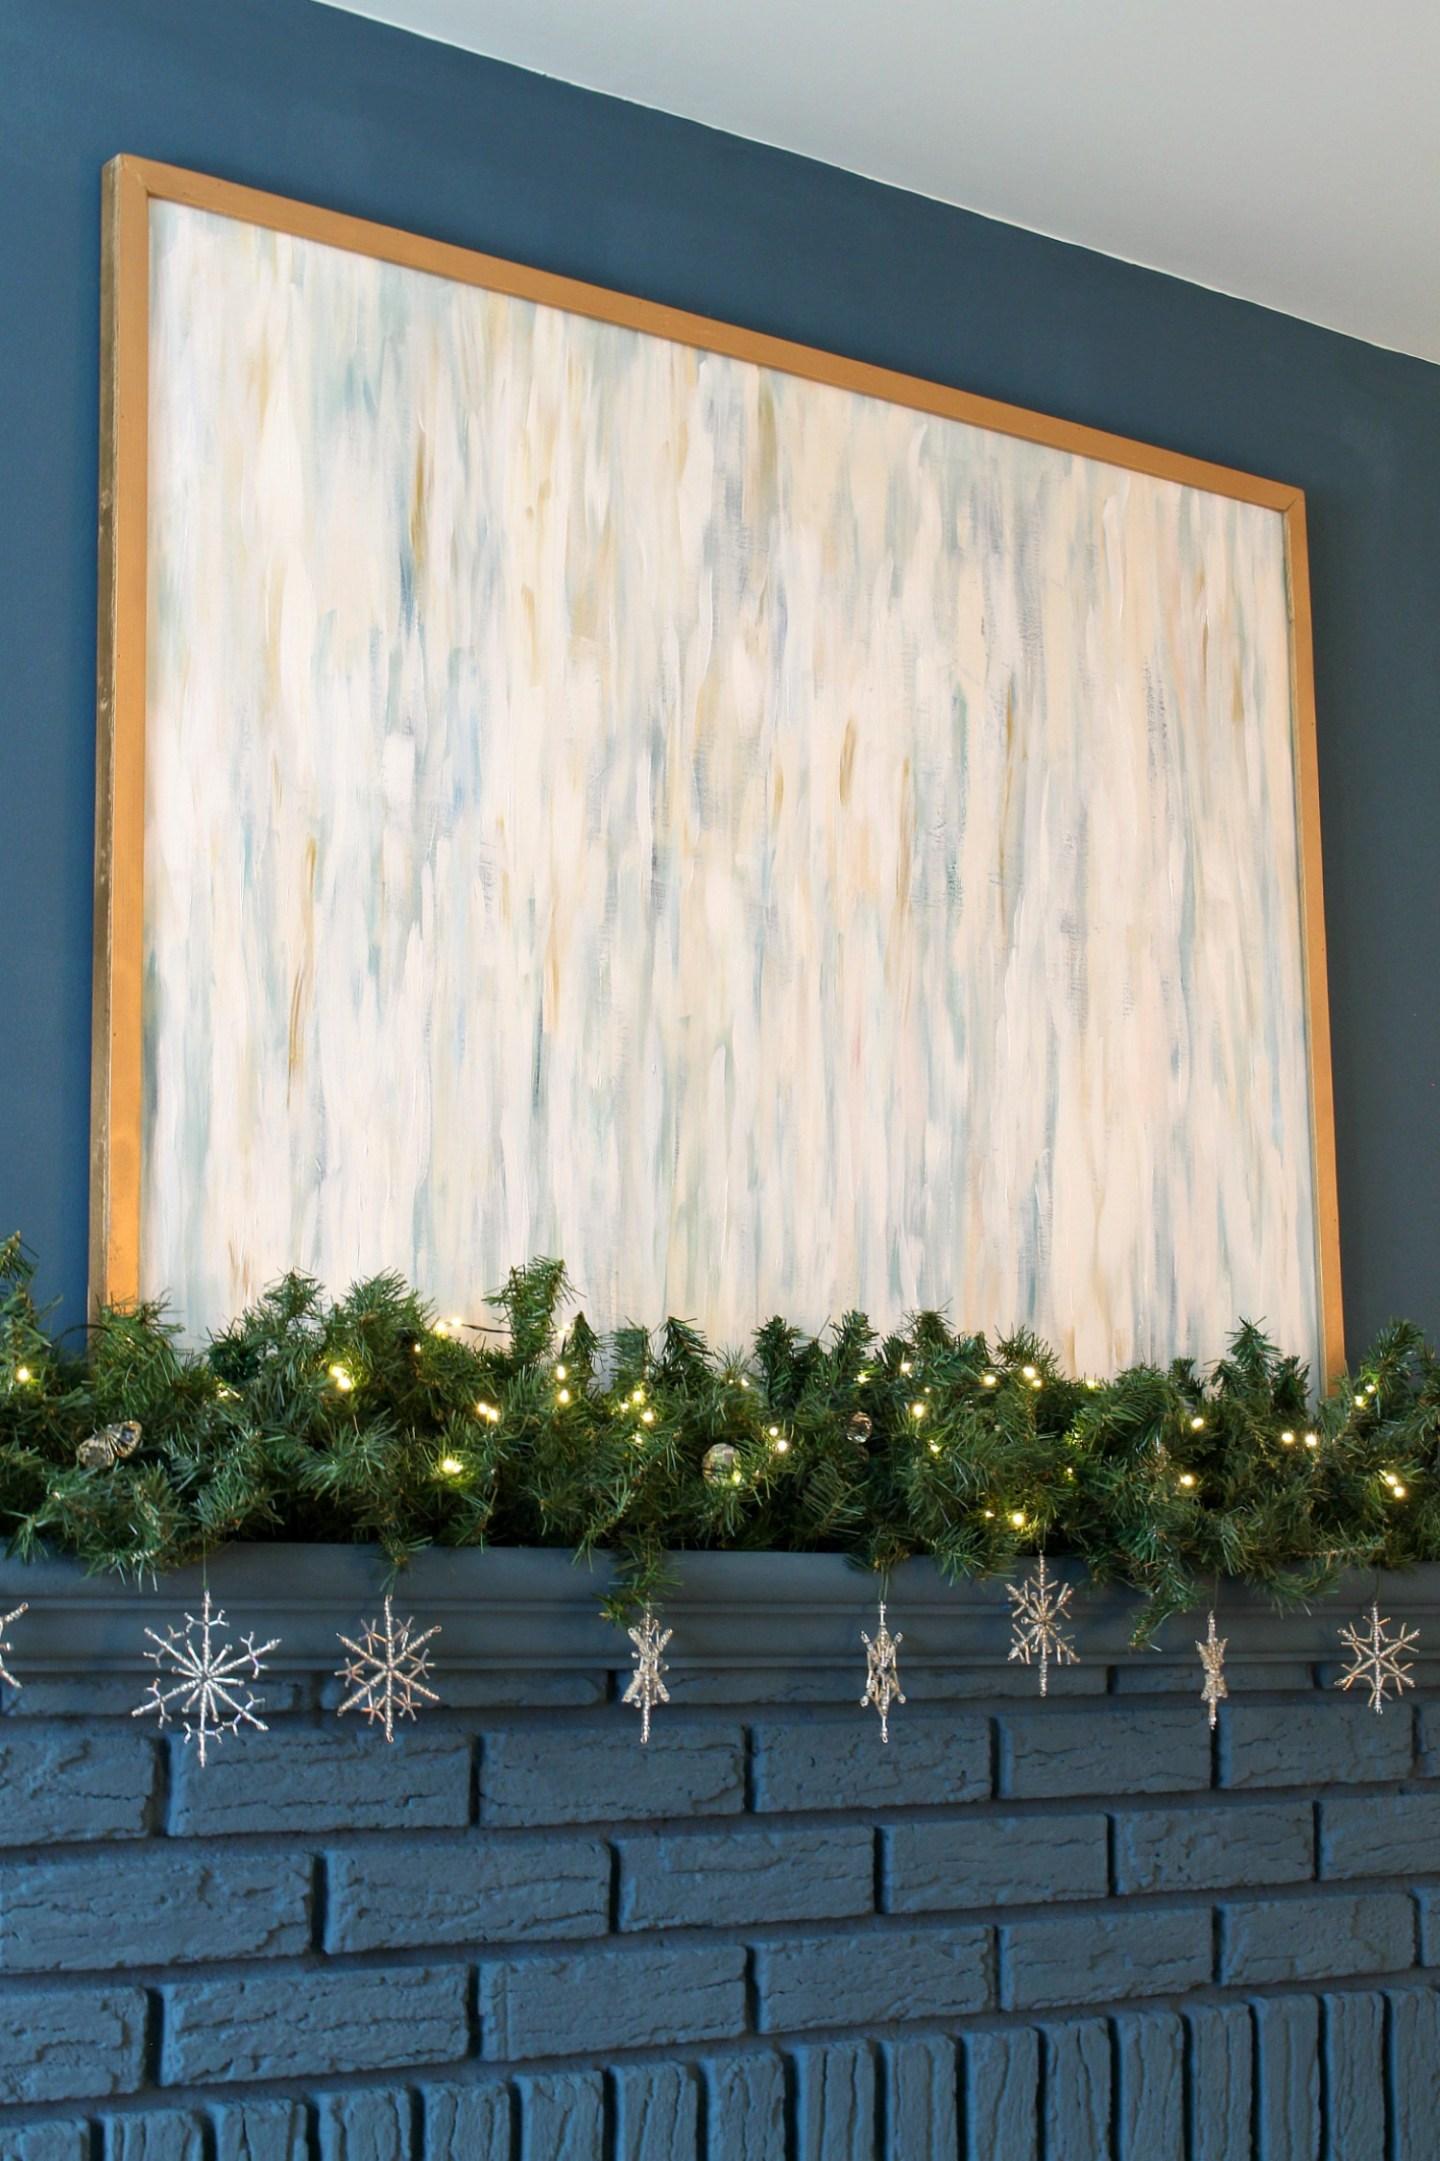 Wintry Mantel Decor Not Christmas